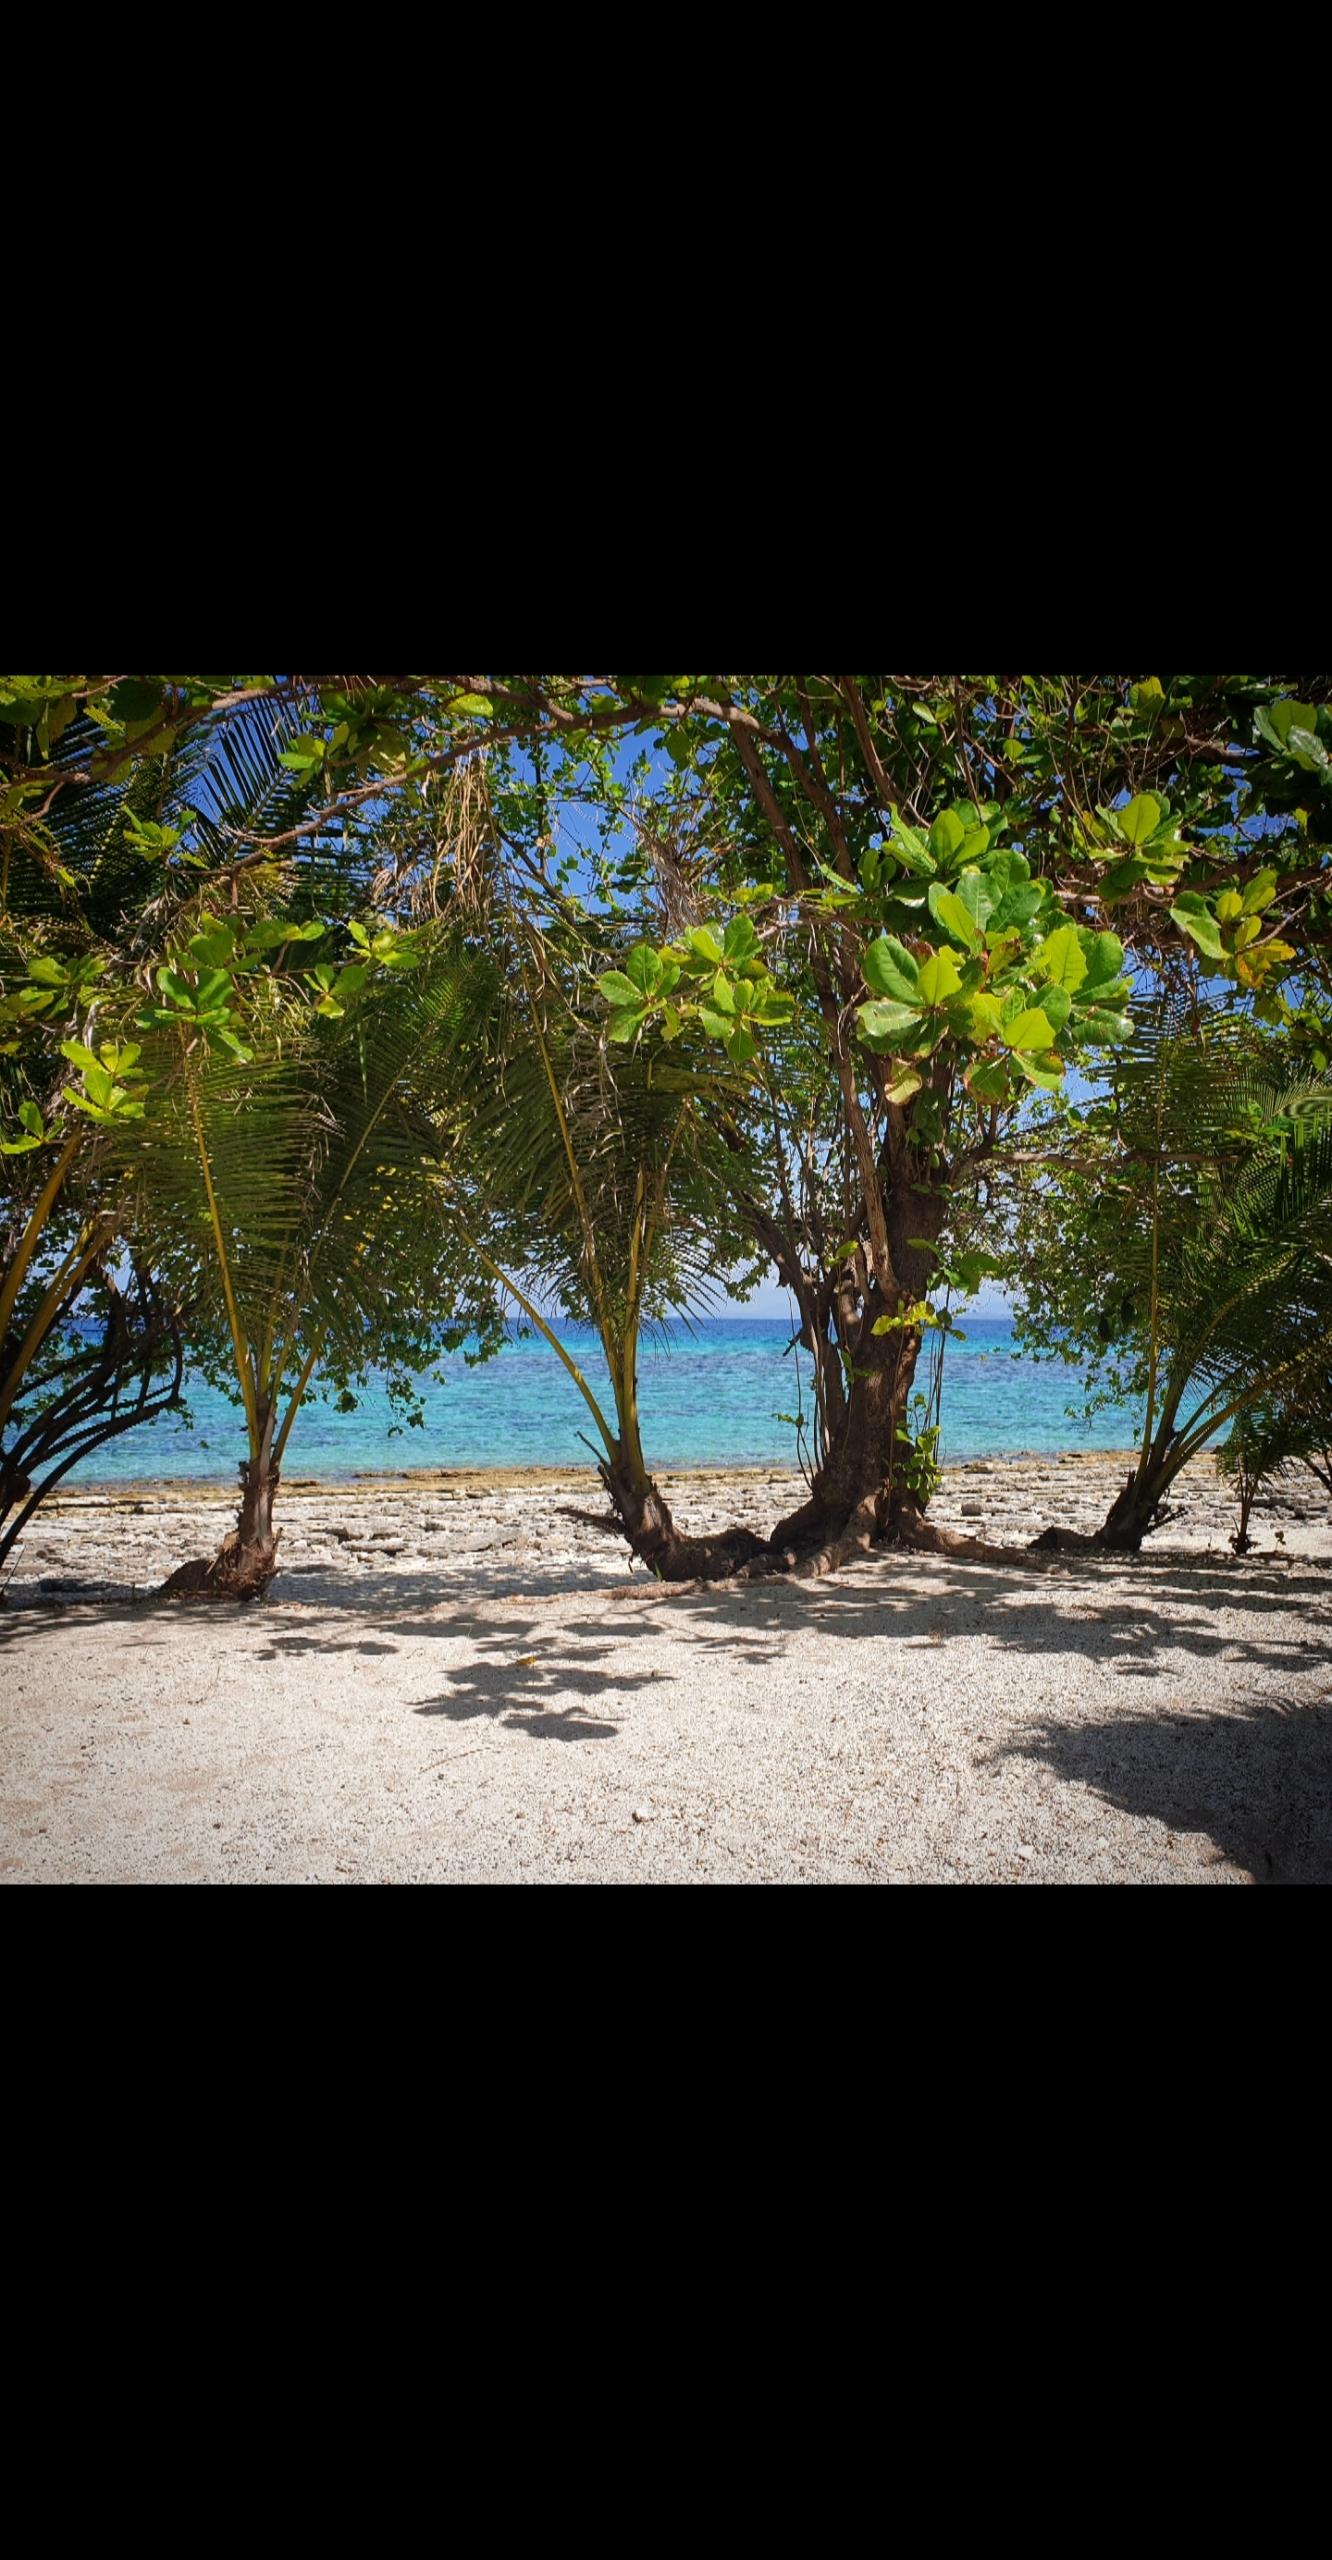 Isola di Malapasqua, Olgiata Diving Febbraio 2020, People 33